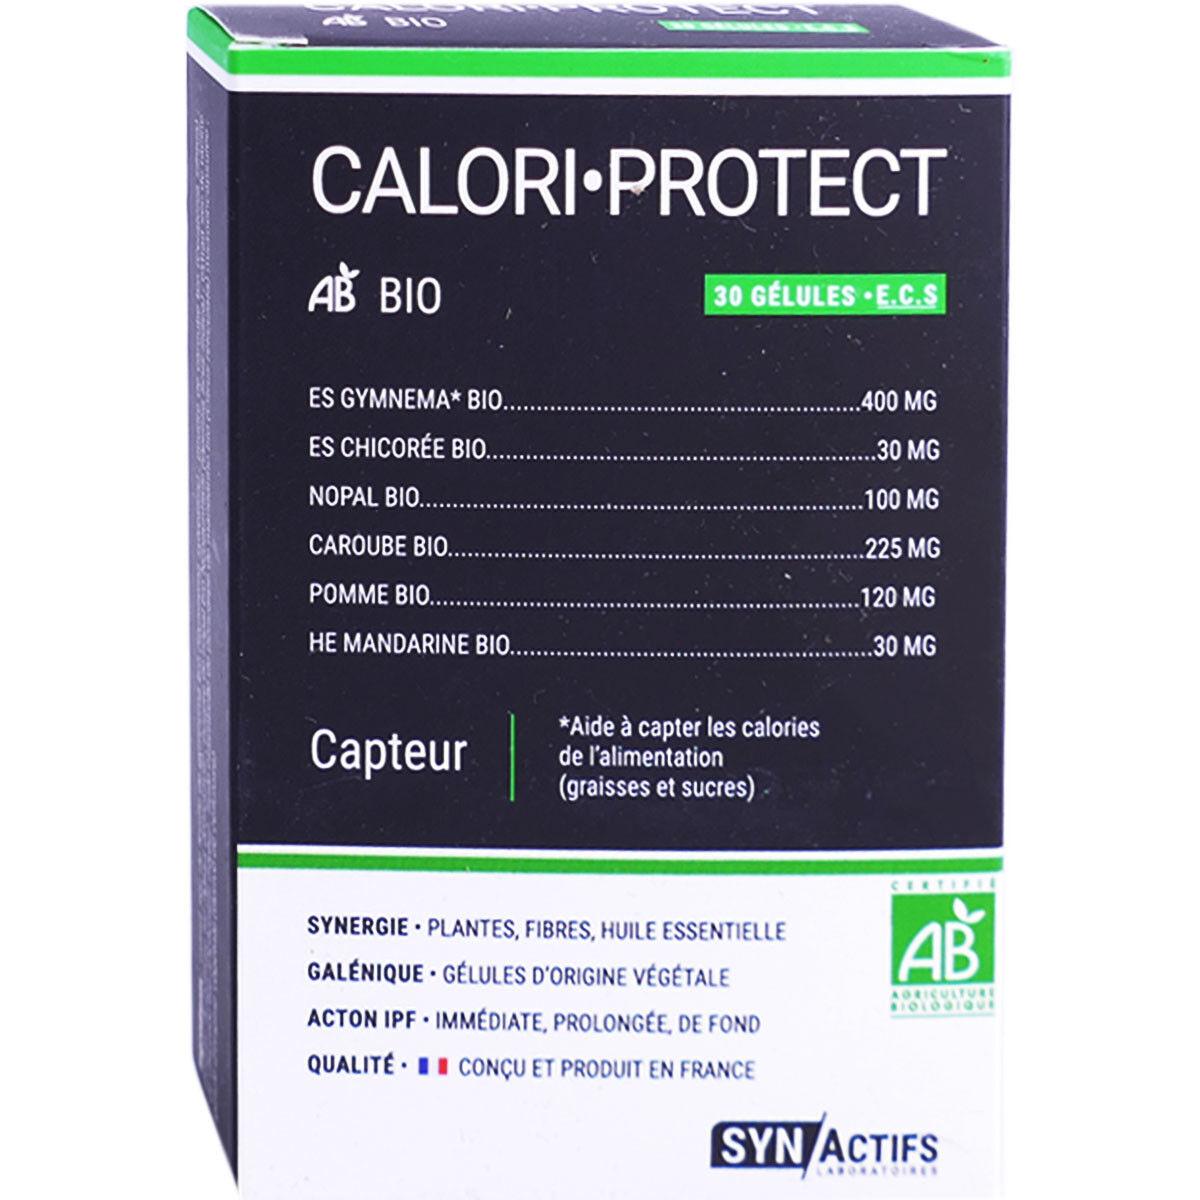 Synactifs calori protect bio 30 gelules